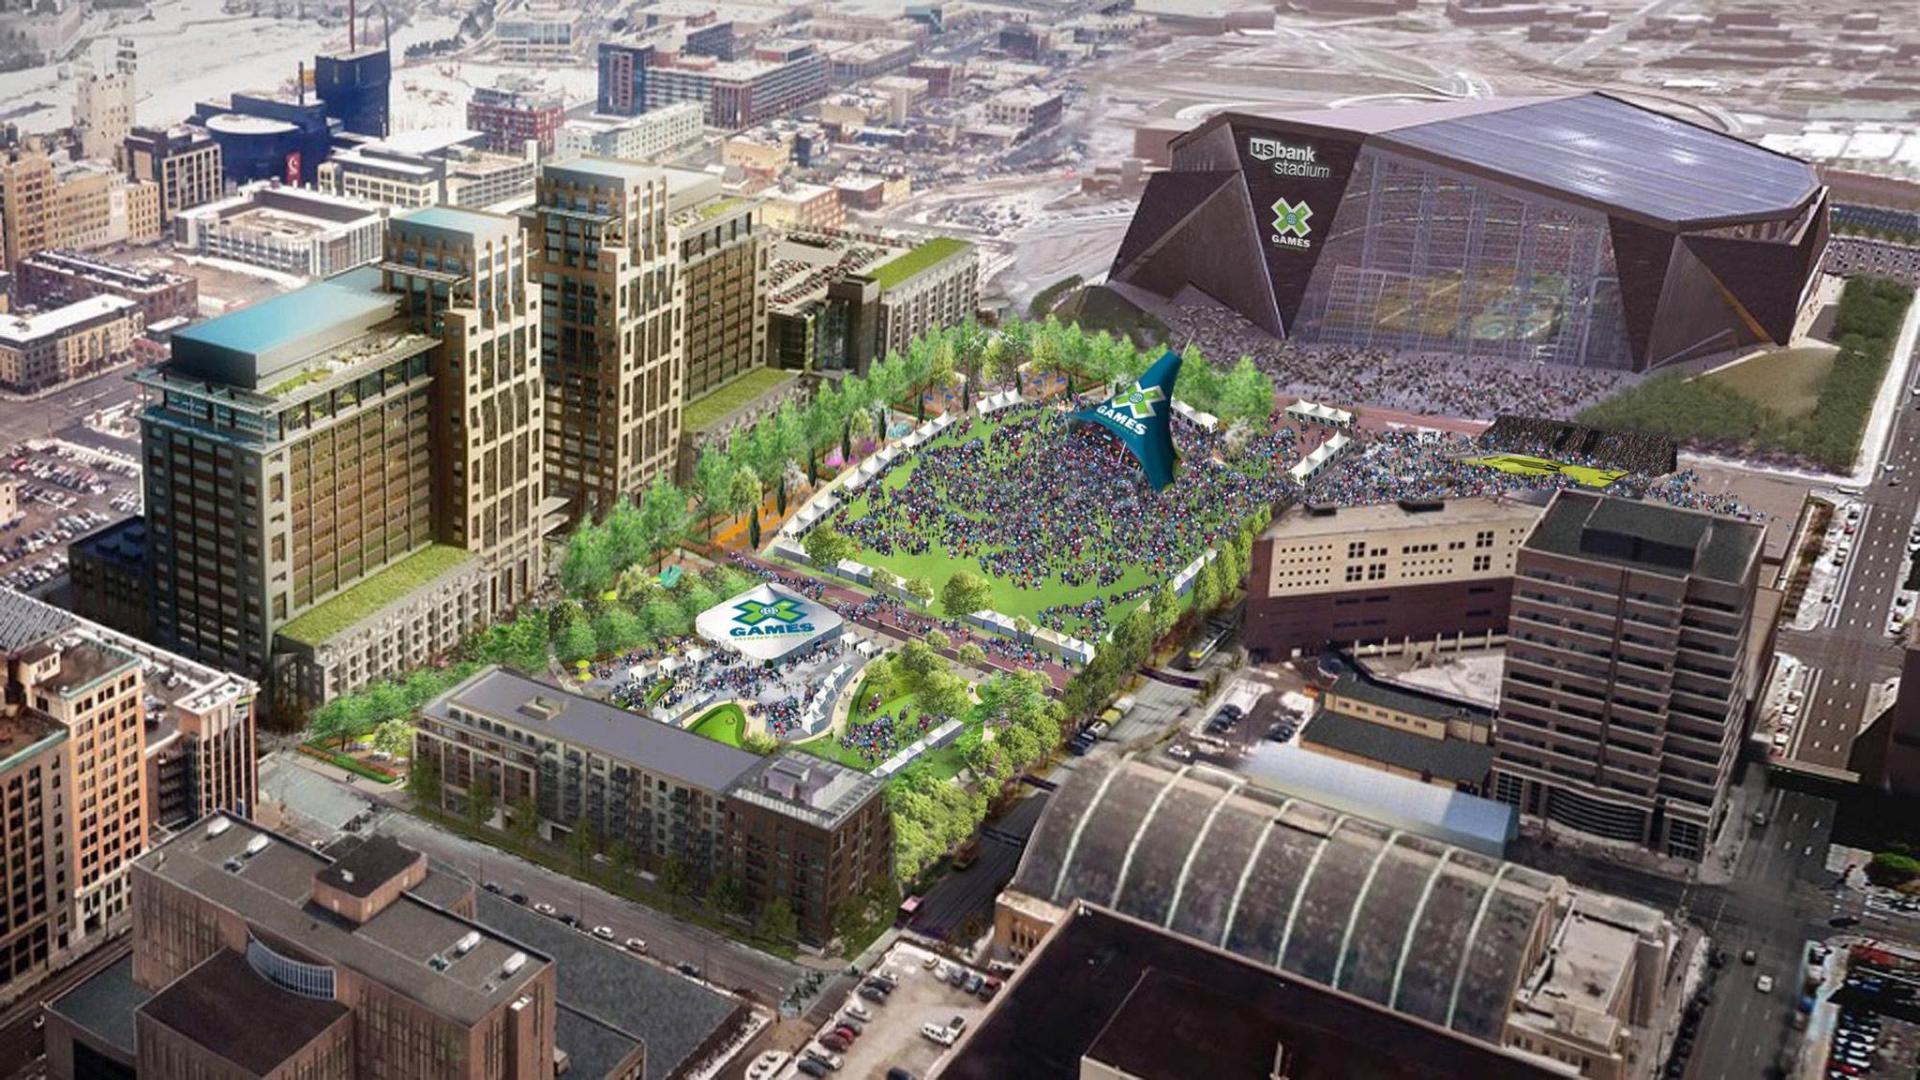 X Games Minneapolis 2020.Espn Selects Minneapolis Minnesota To Host X Games In